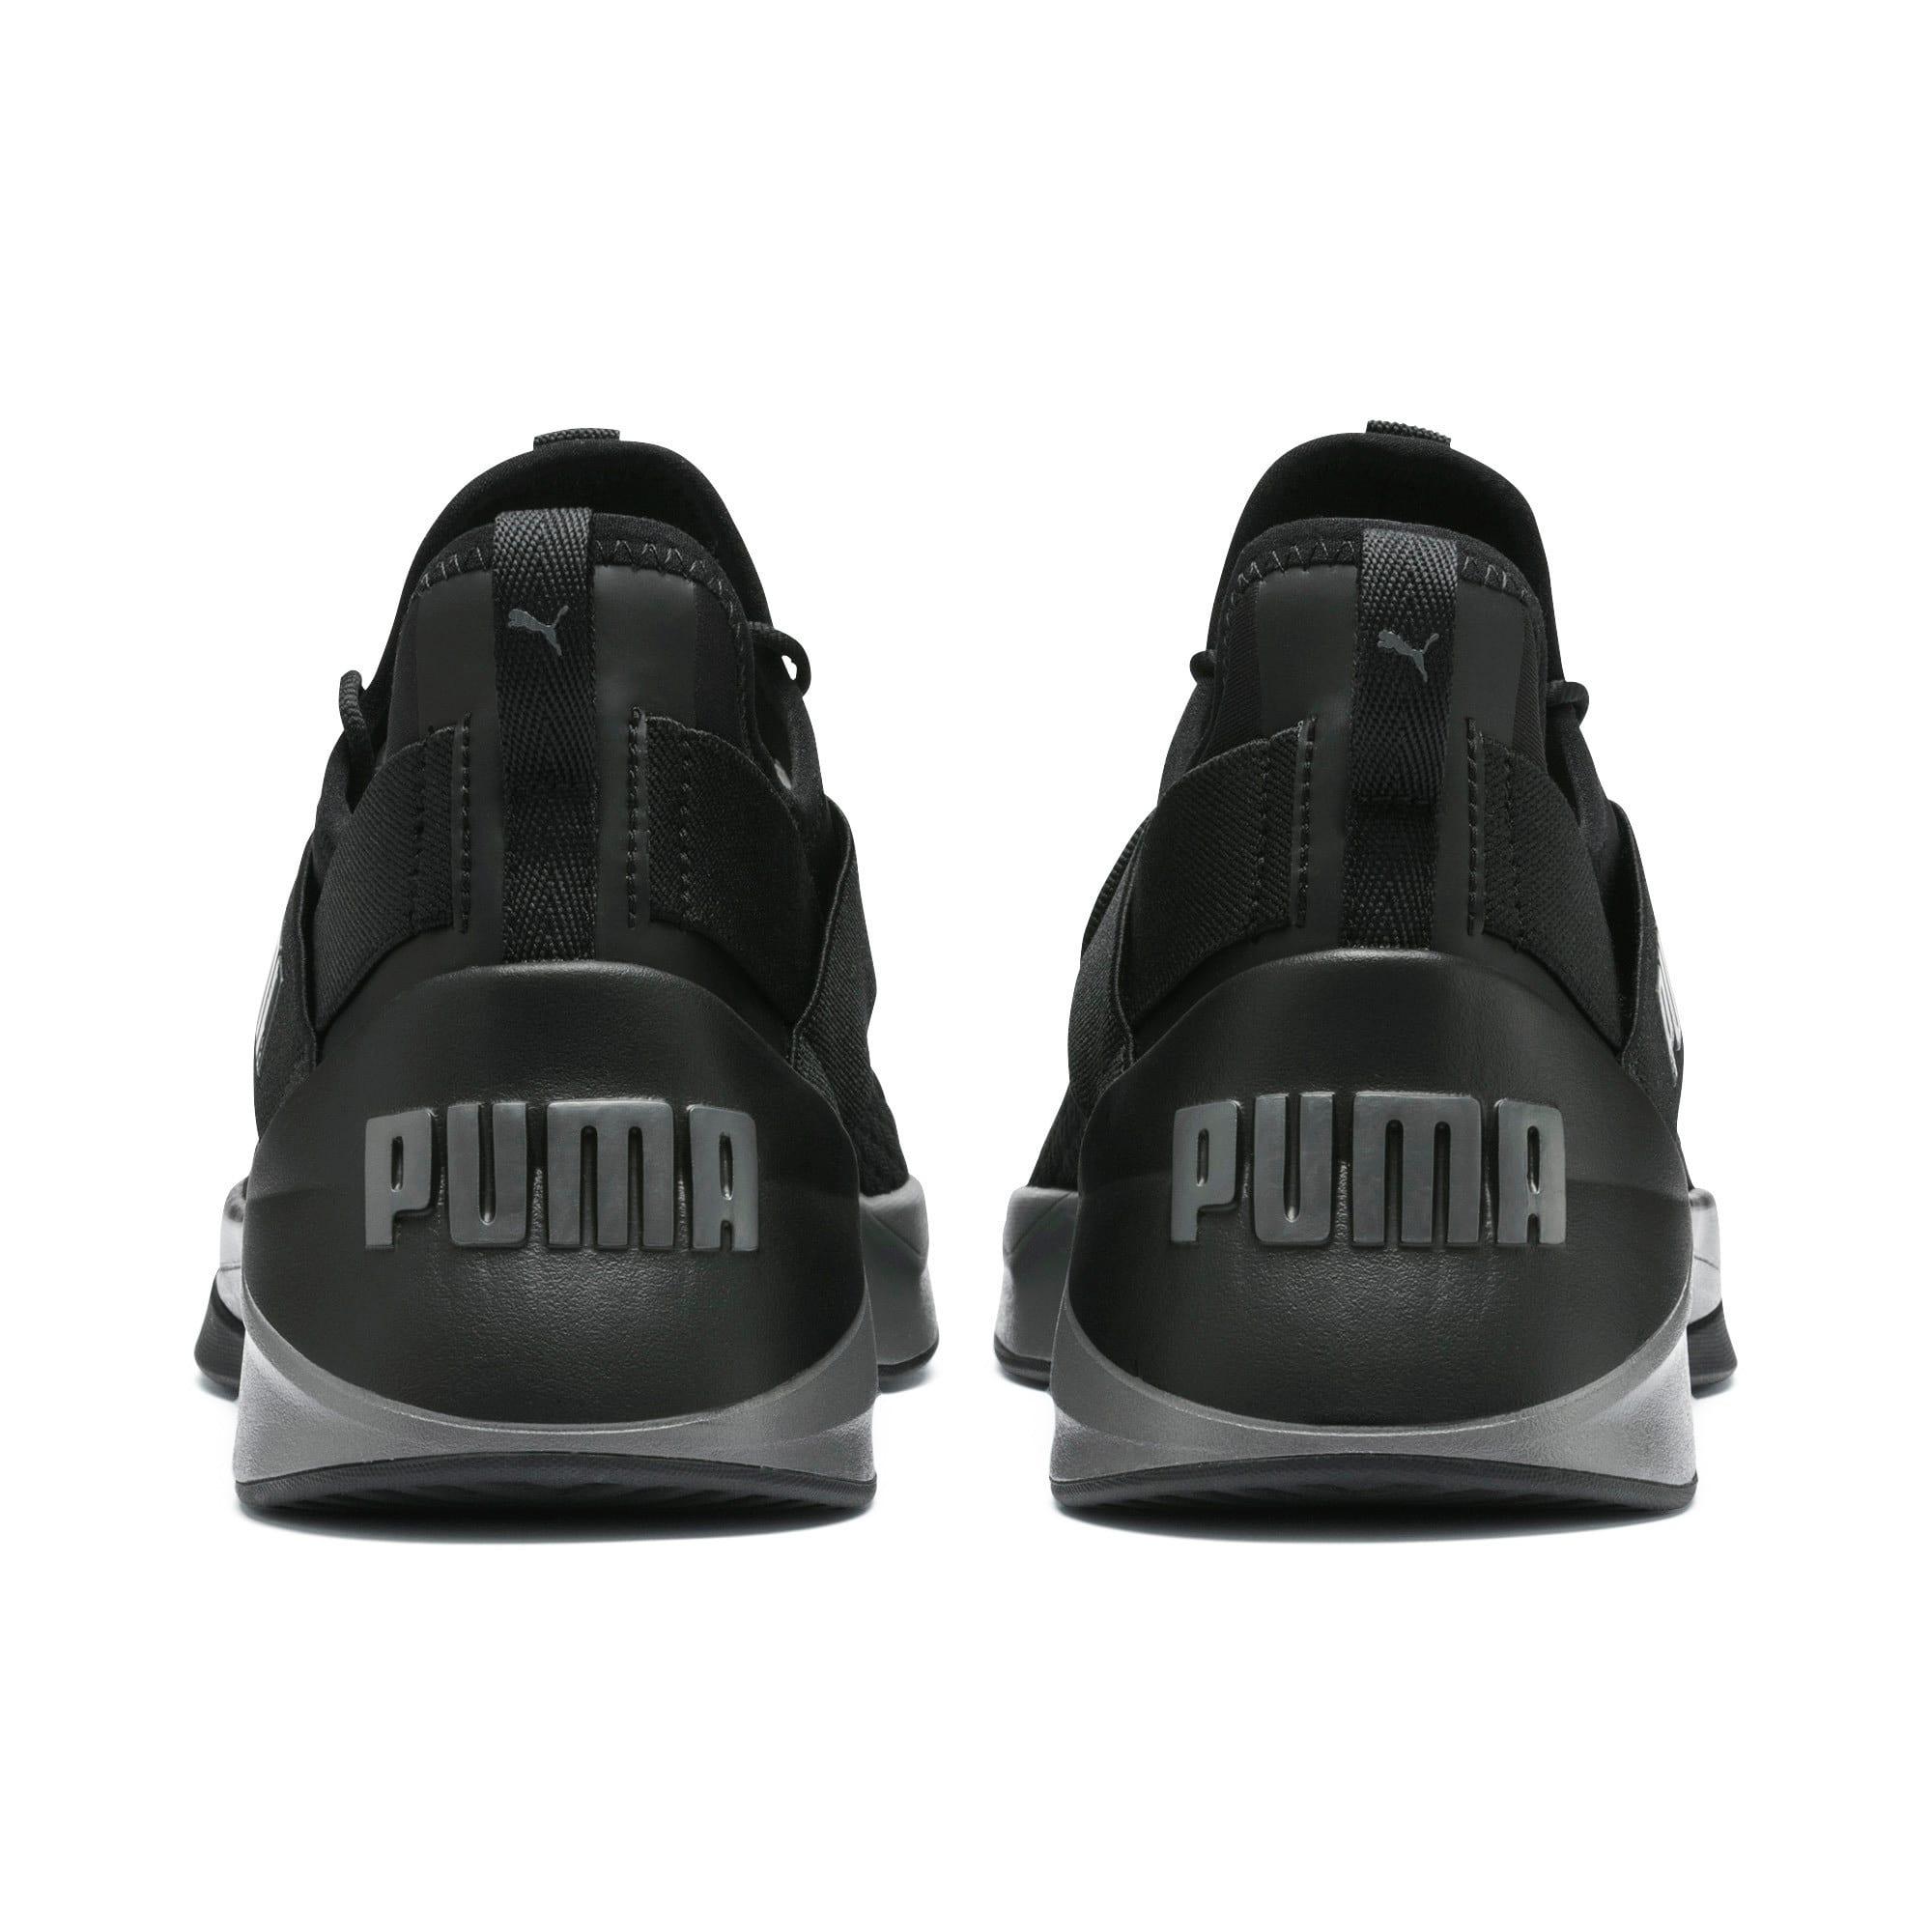 Thumbnail 4 of JAAB XT, Puma Black-CASTLEROCK, medium-JPN